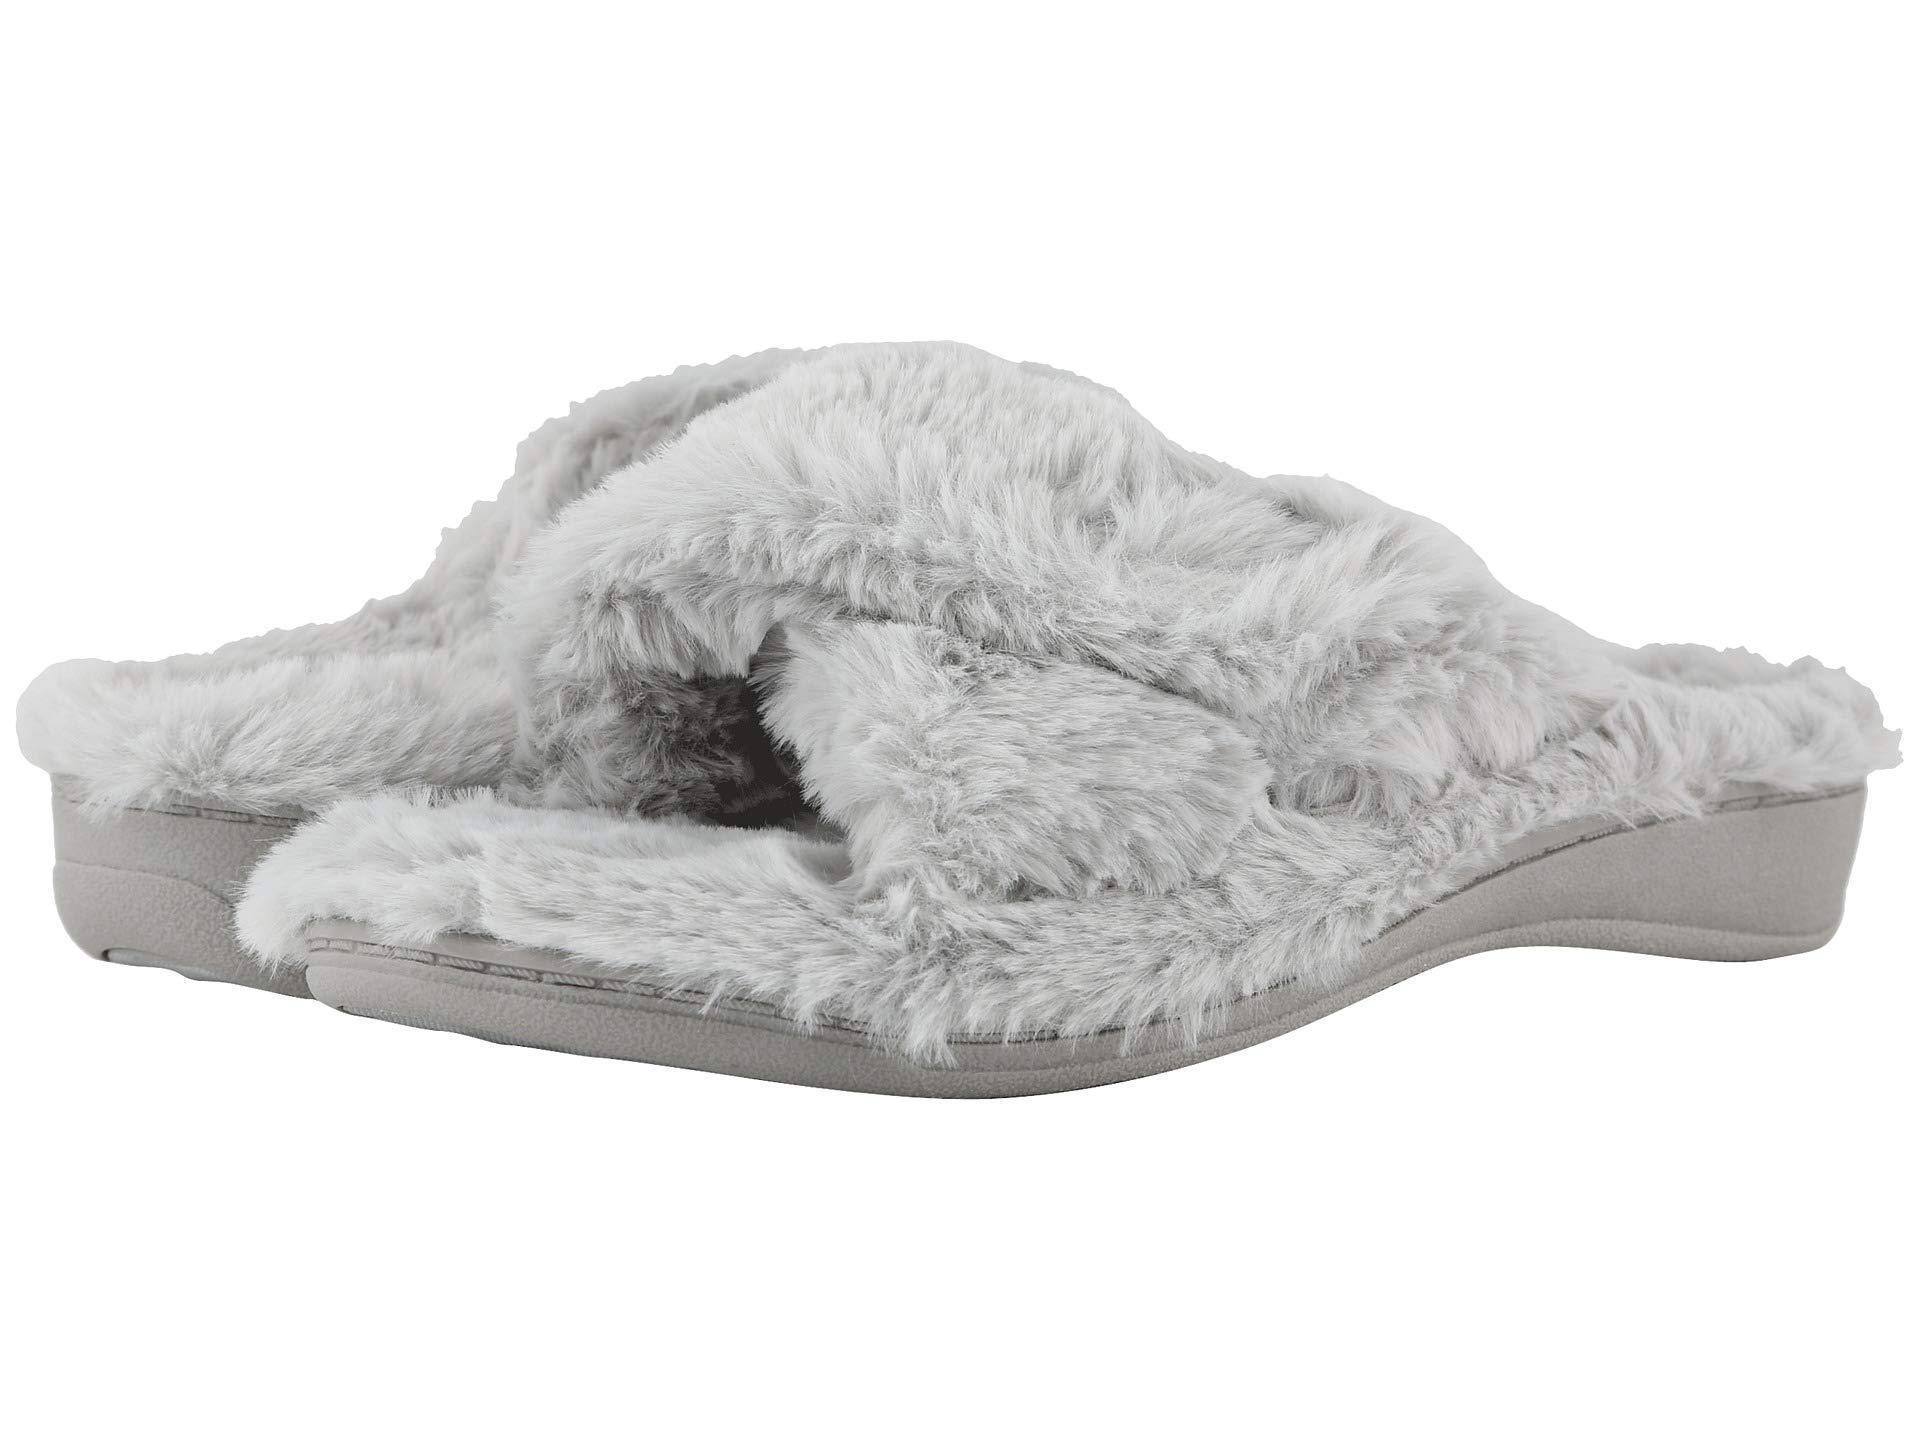 14c628ec9b1 Lyst - Vionic Relax Plush (blush) Women's Slippers in Gray